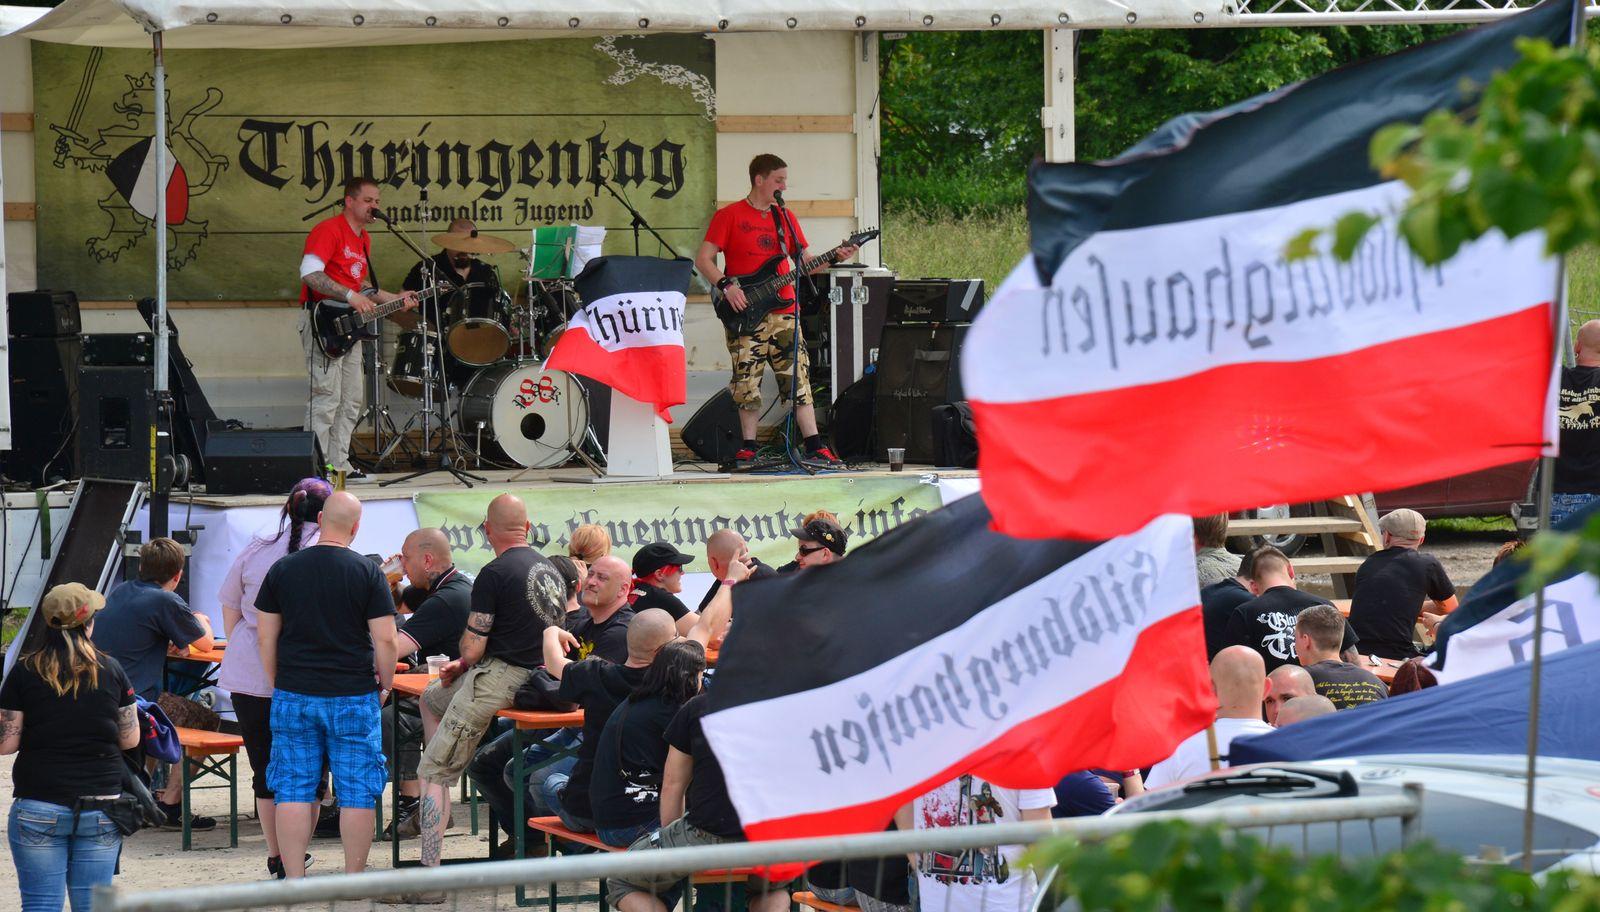 Thüringen/ Kahla/ Fremndenfeindlichkeit, Nazis